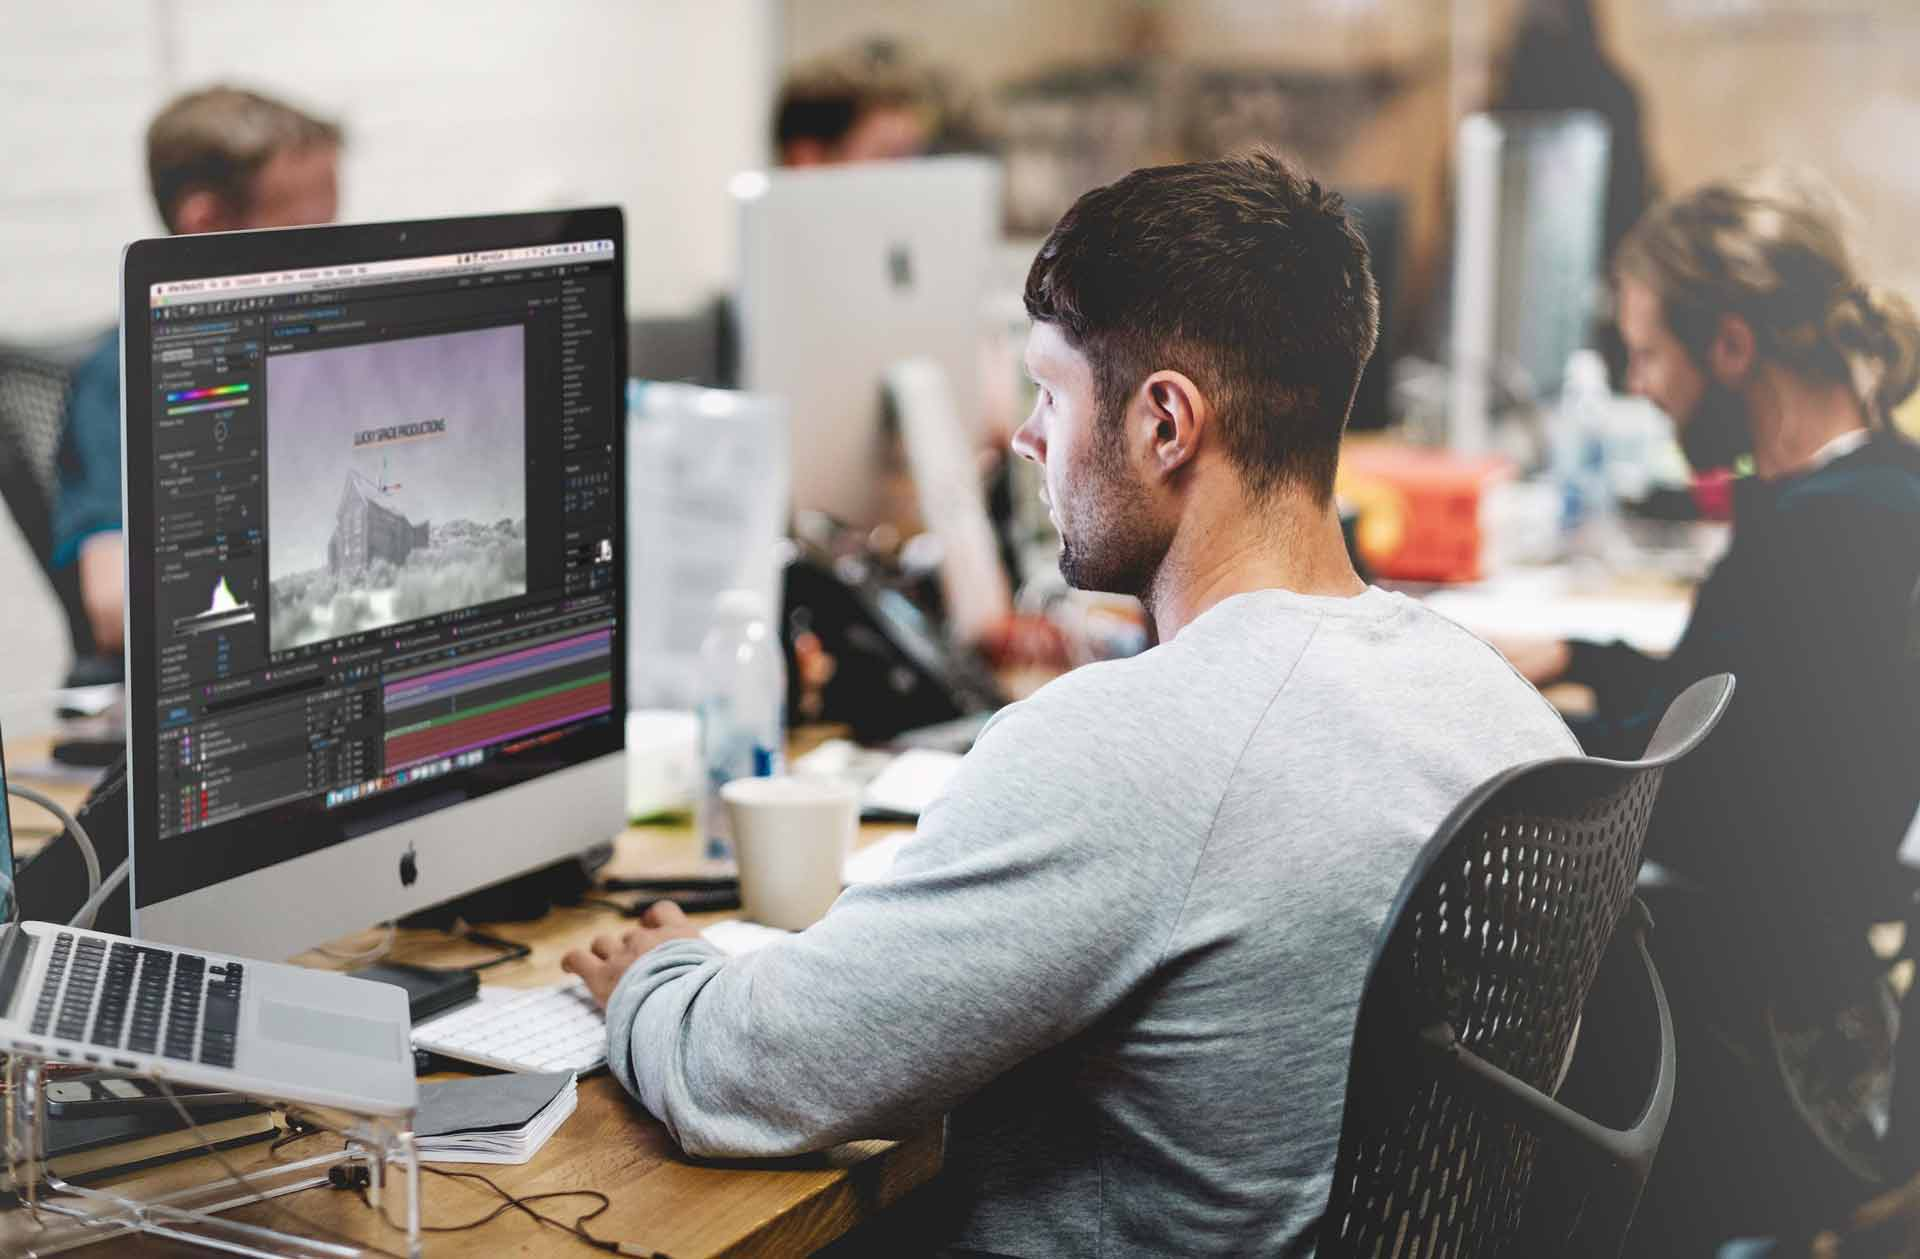 Grapgic-Designer-Working-Adobe-After-Effects-AE.jpg